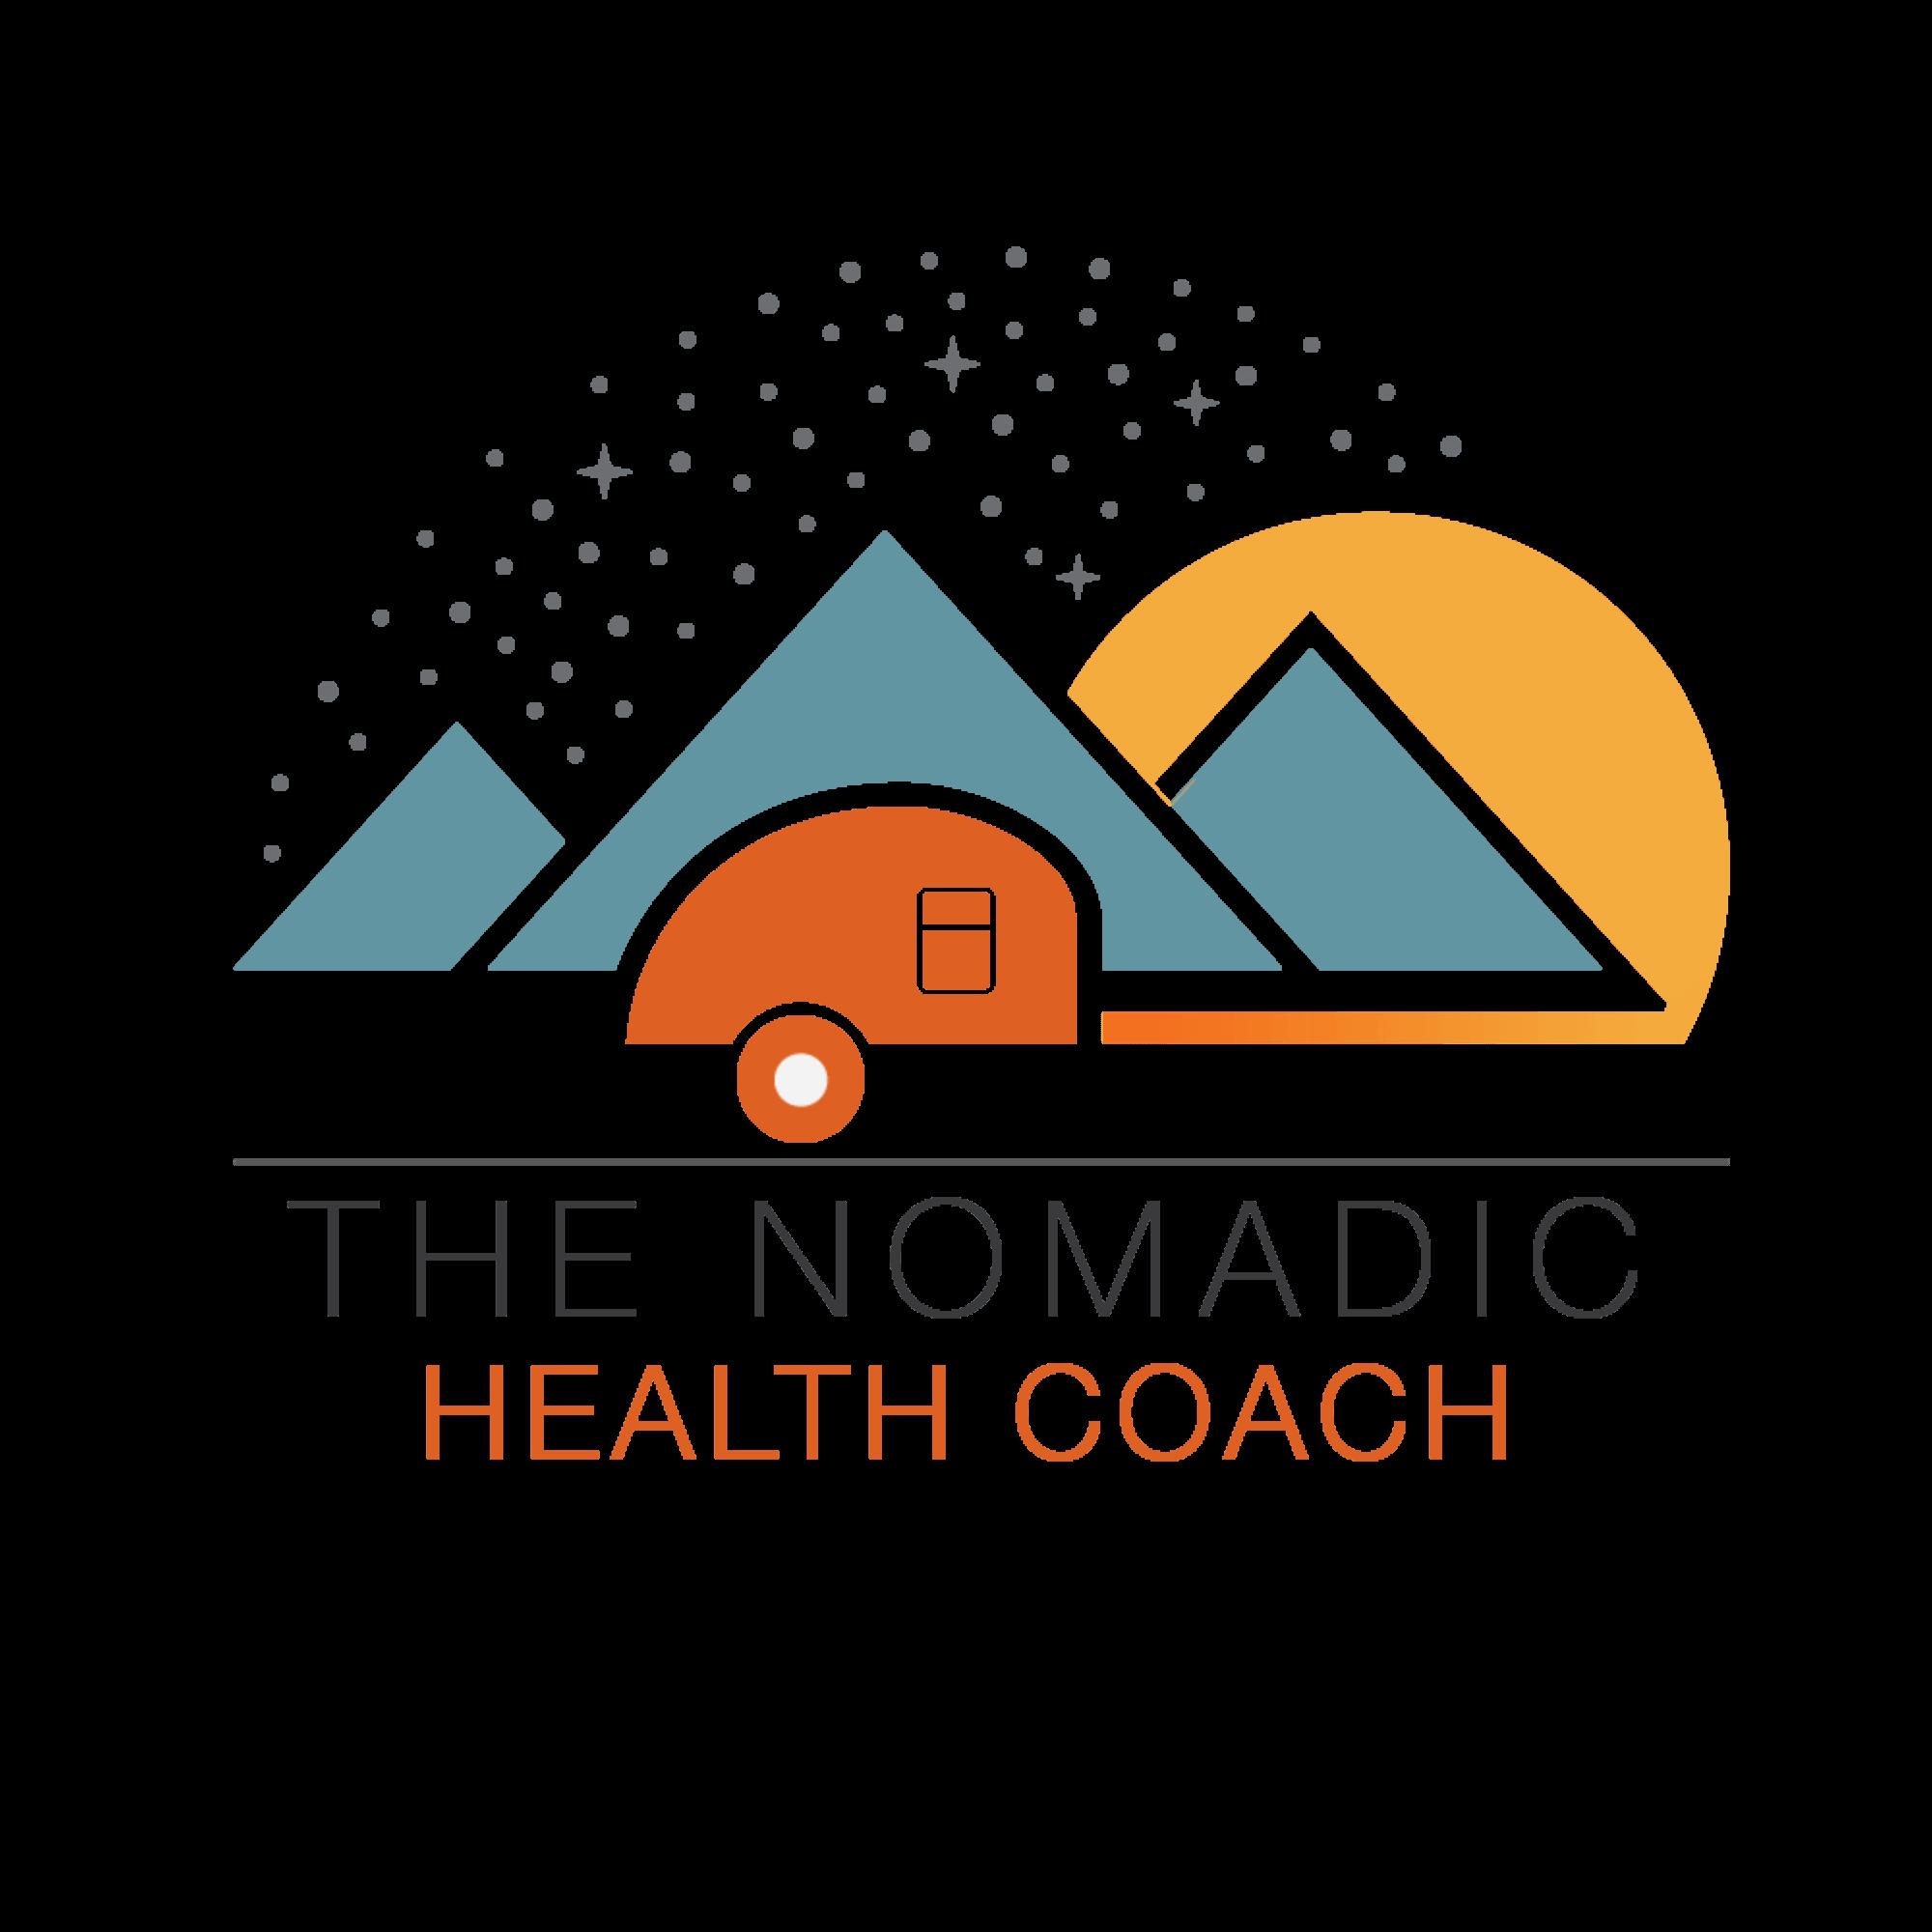 Nomadic Health Coach - Lorri Weisen